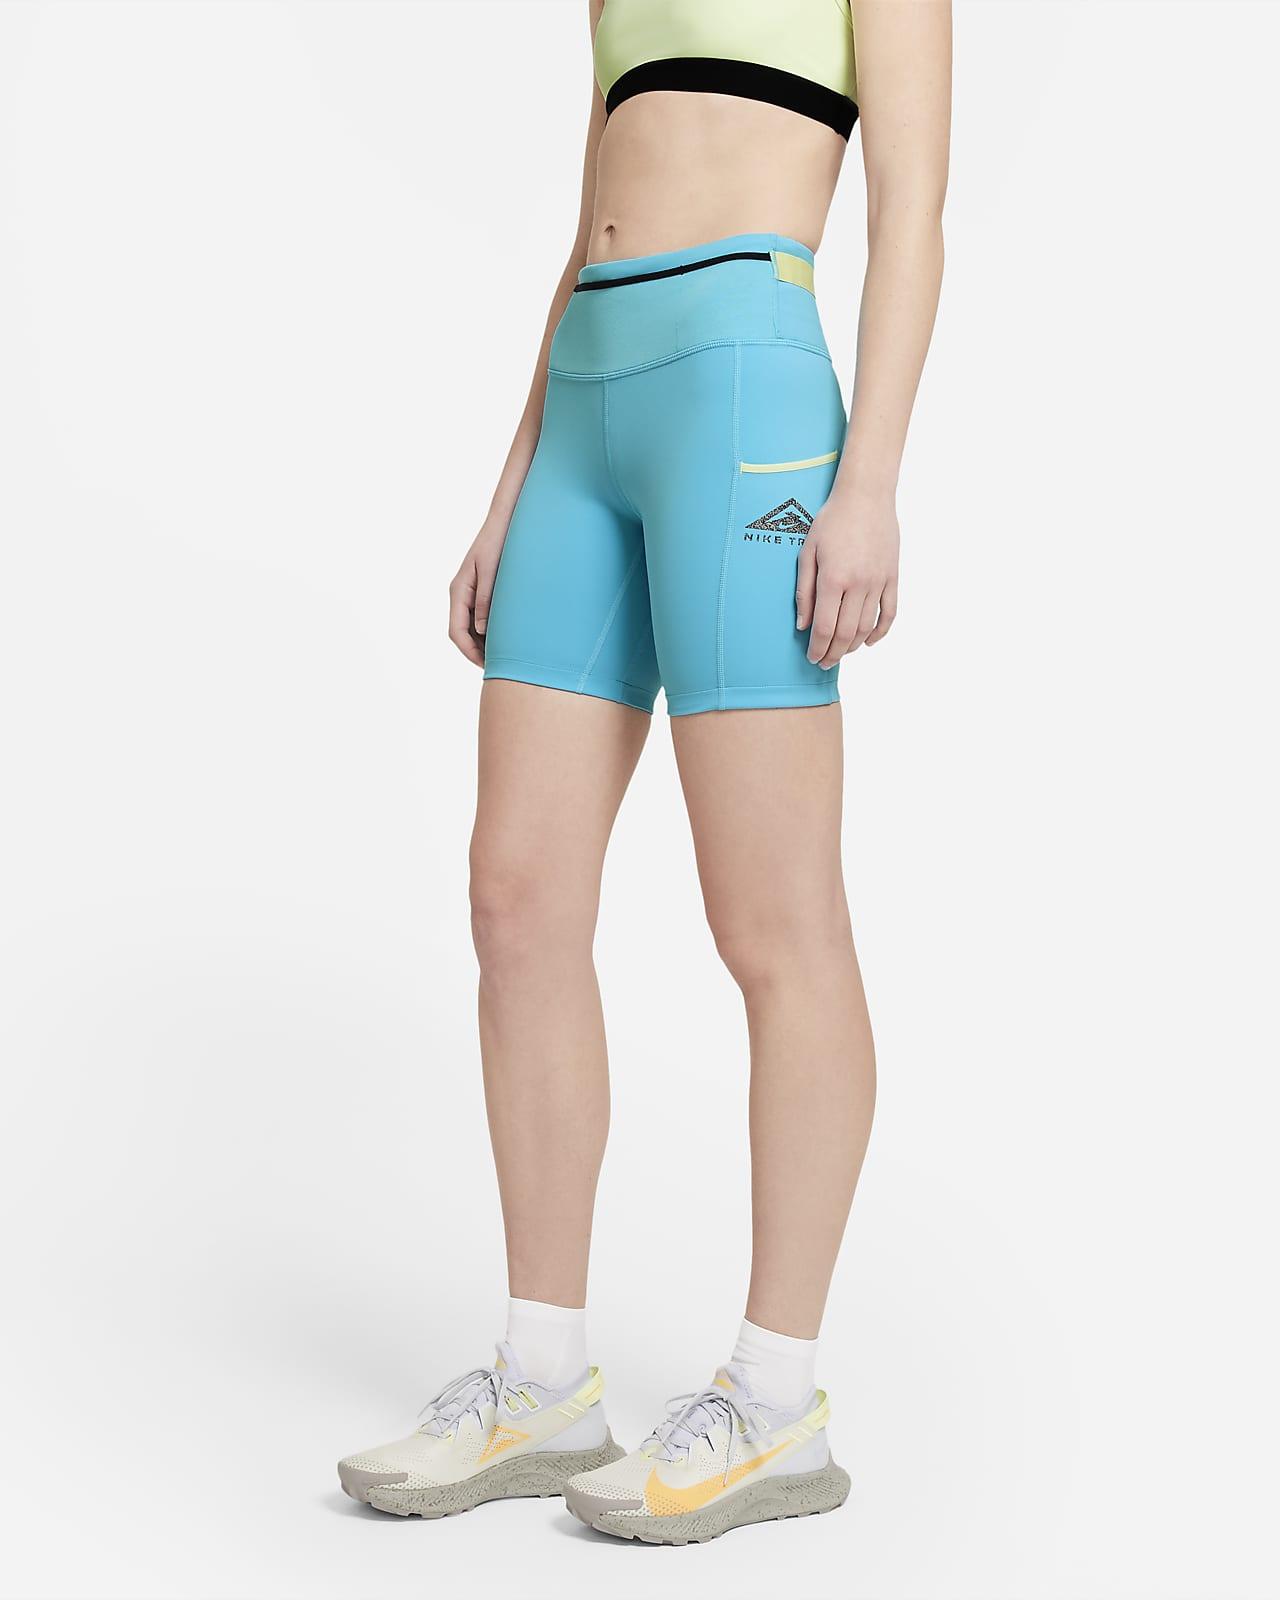 Shorts de trail running para mujer Nike Epic Luxe